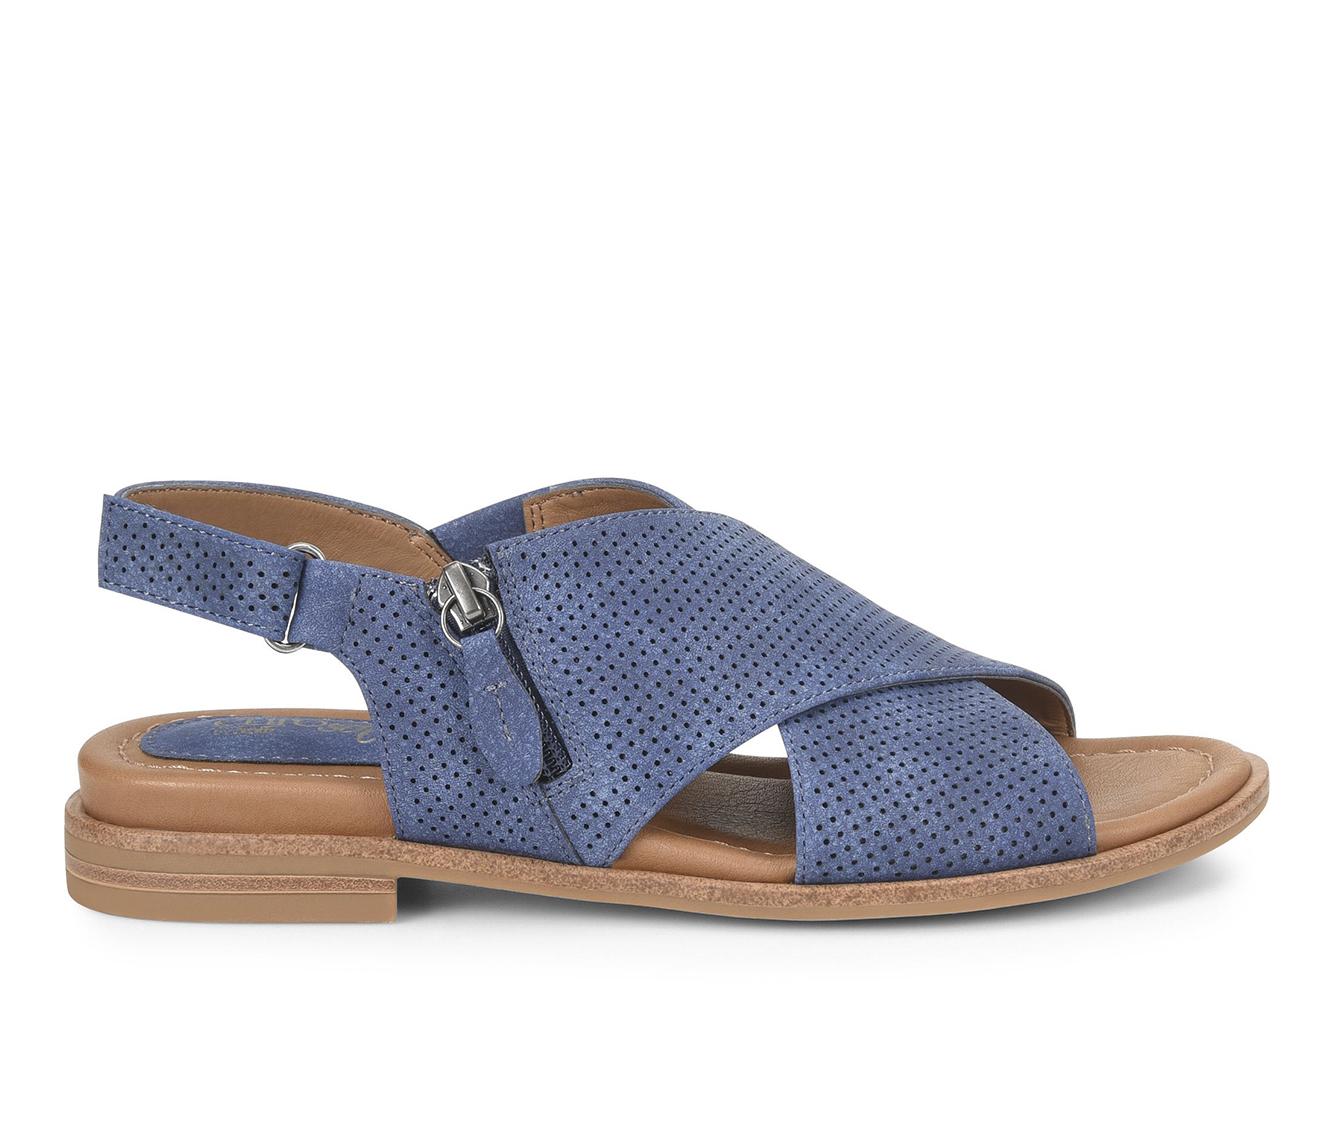 EuroSoft Darla Women's Sandal (Blue Faux Leather)